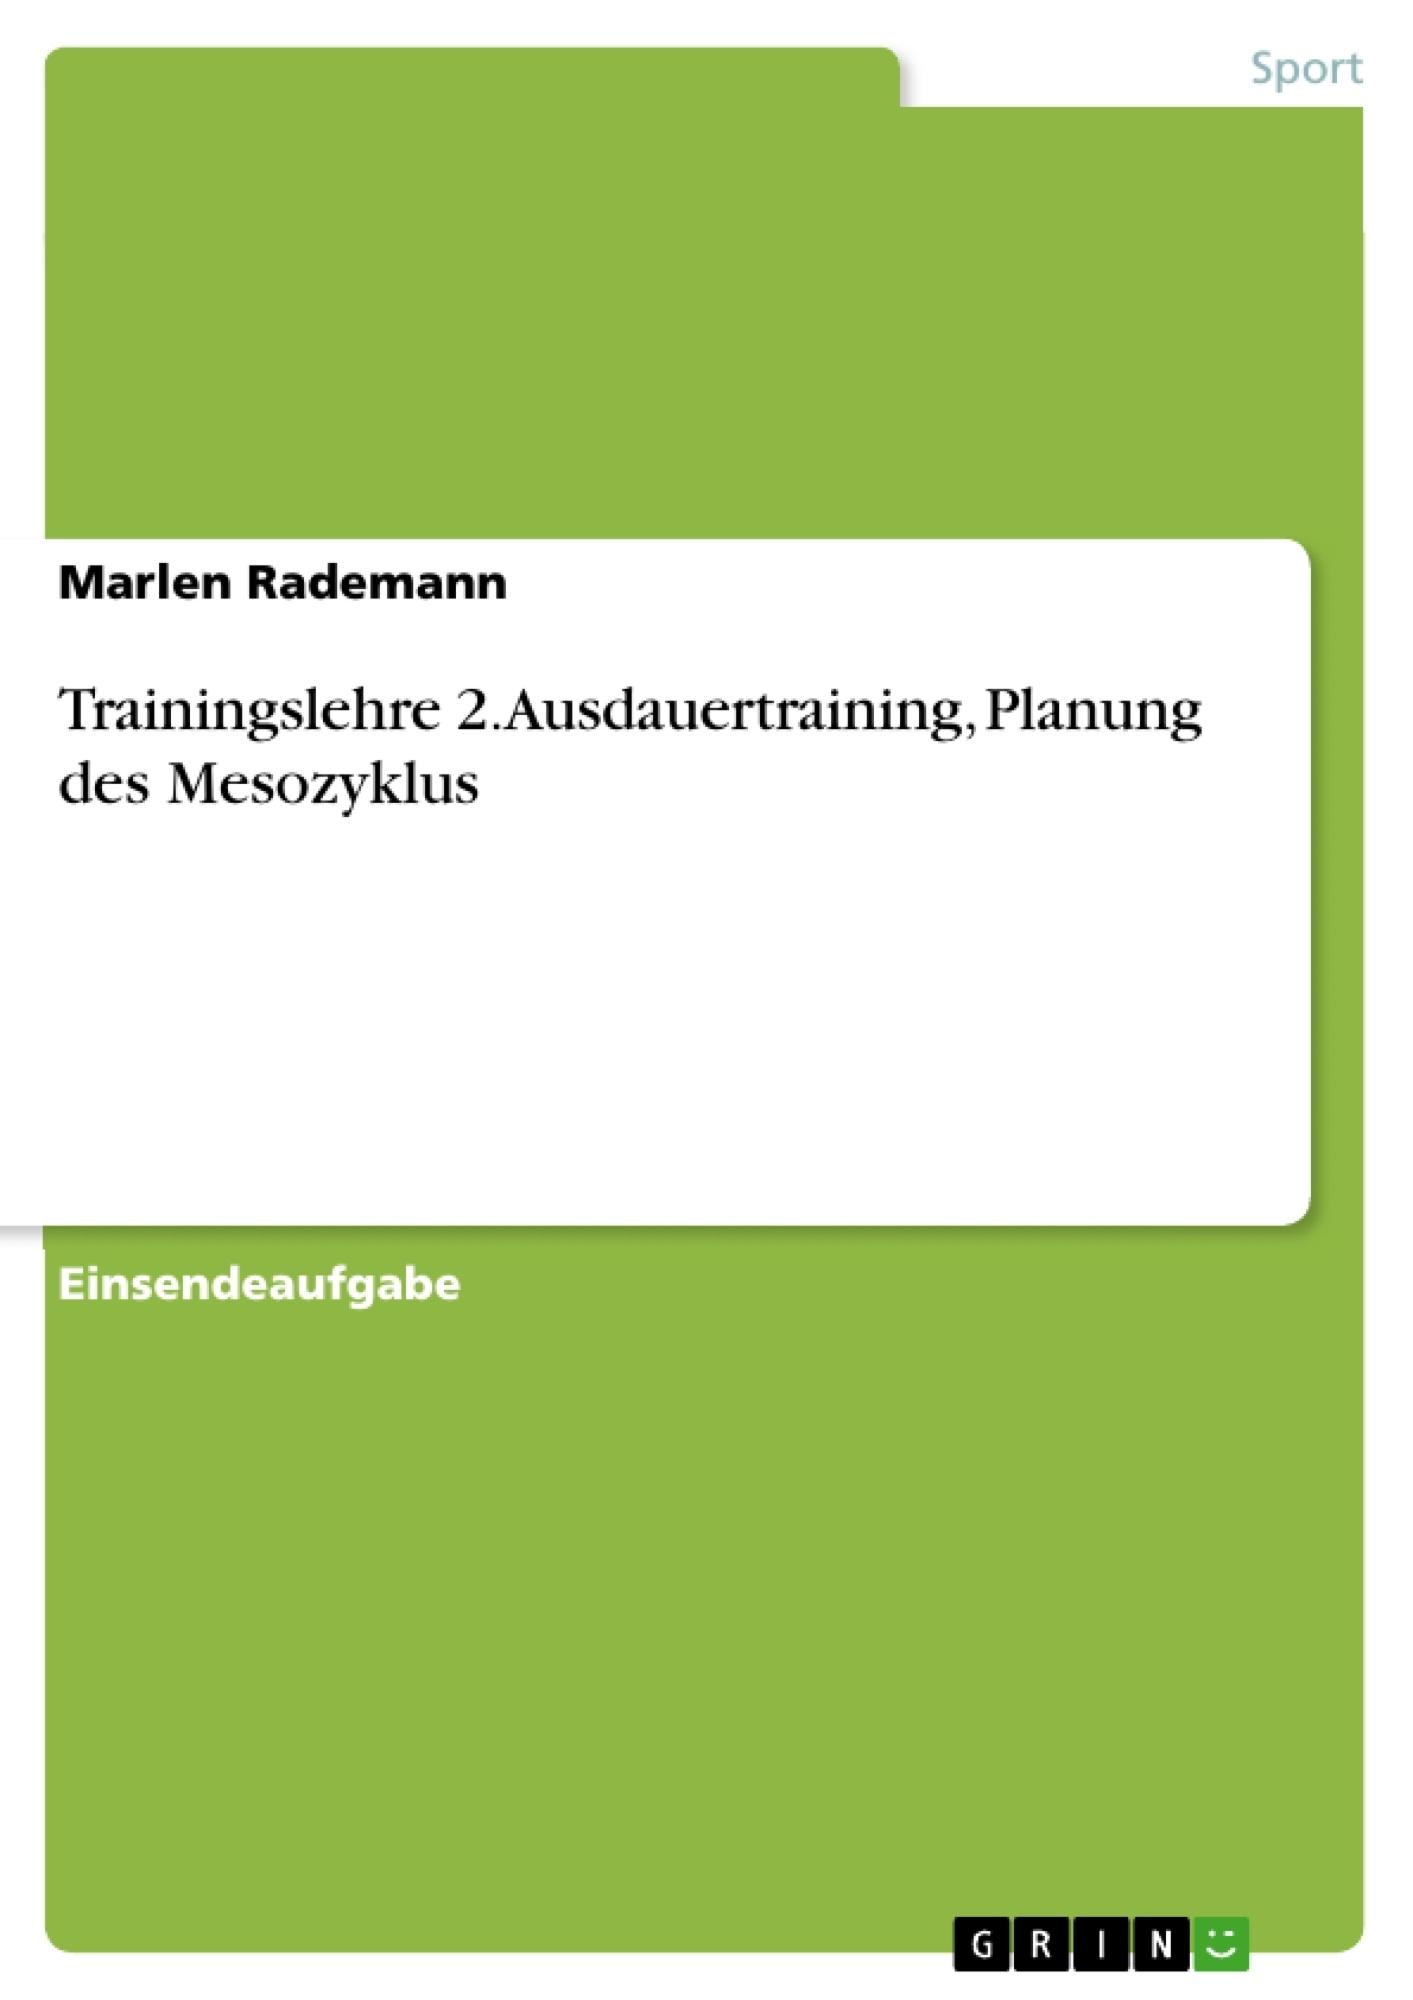 Titel: Trainingslehre 2. Ausdauertraining, Planung des Mesozyklus